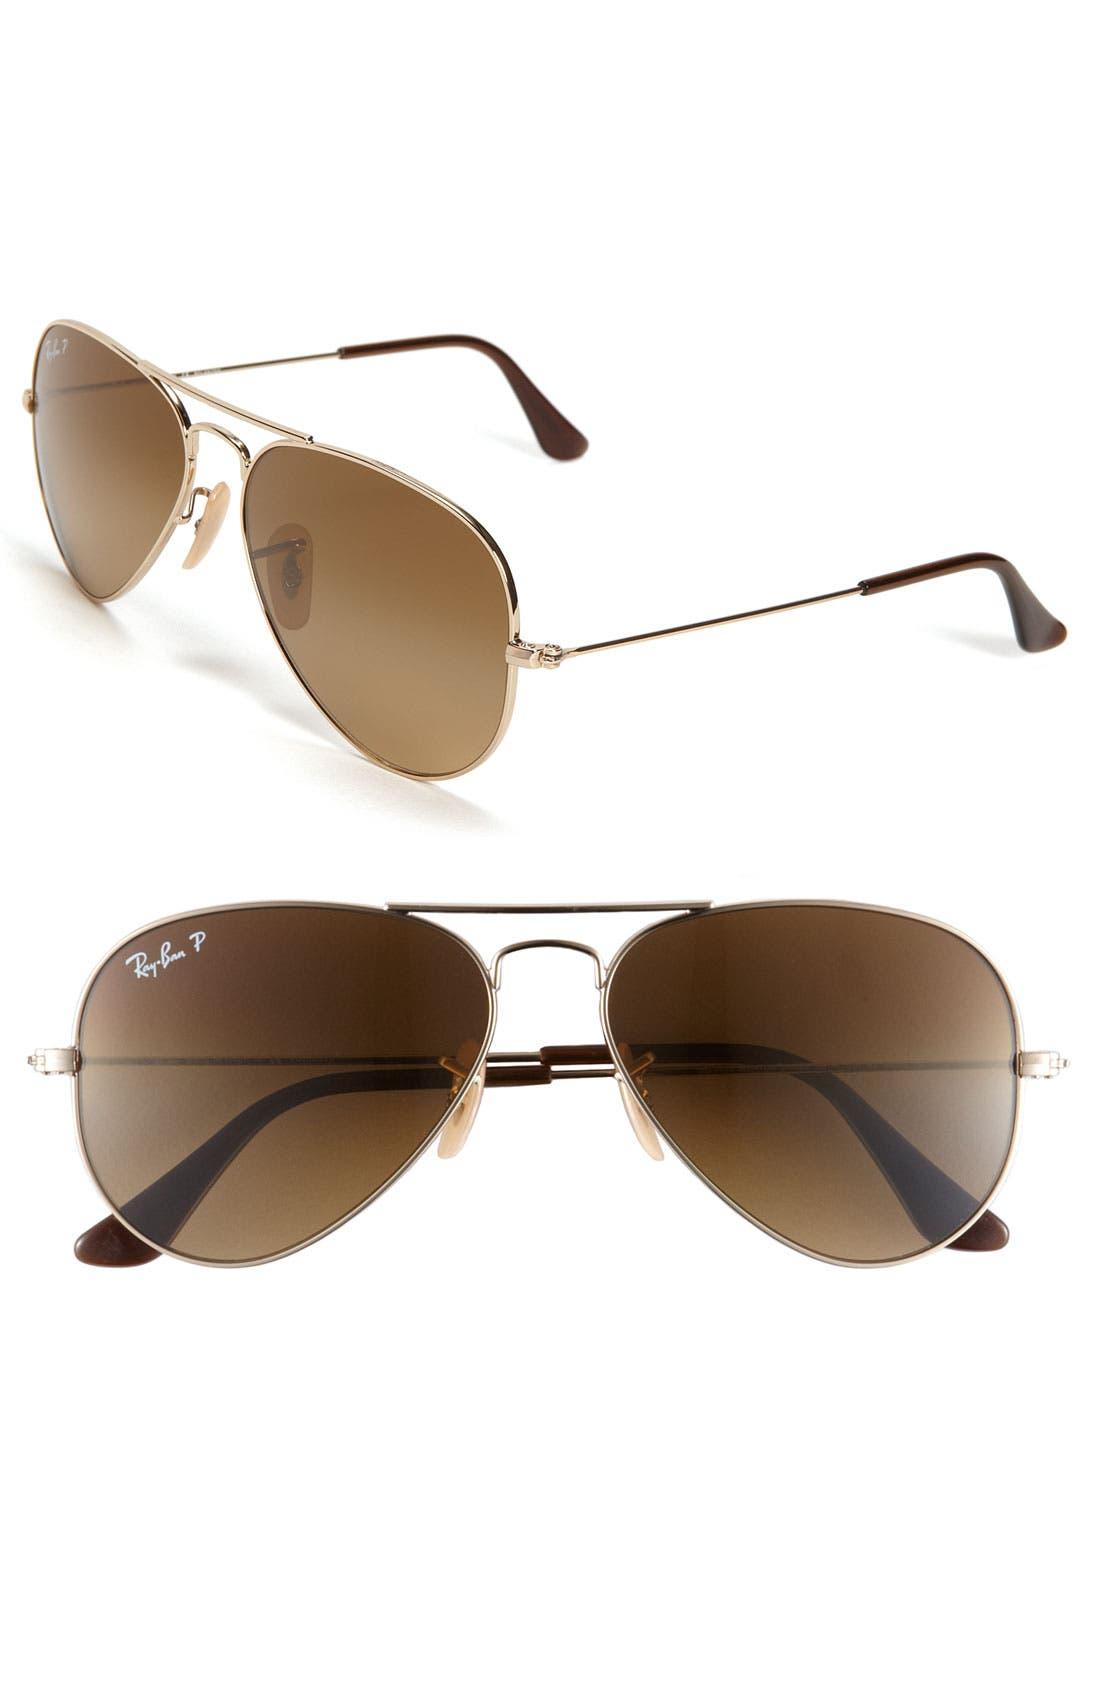 Alternate Image 1 Selected - Ray-Ban 'Original' Polarized Aviator Sunglasses